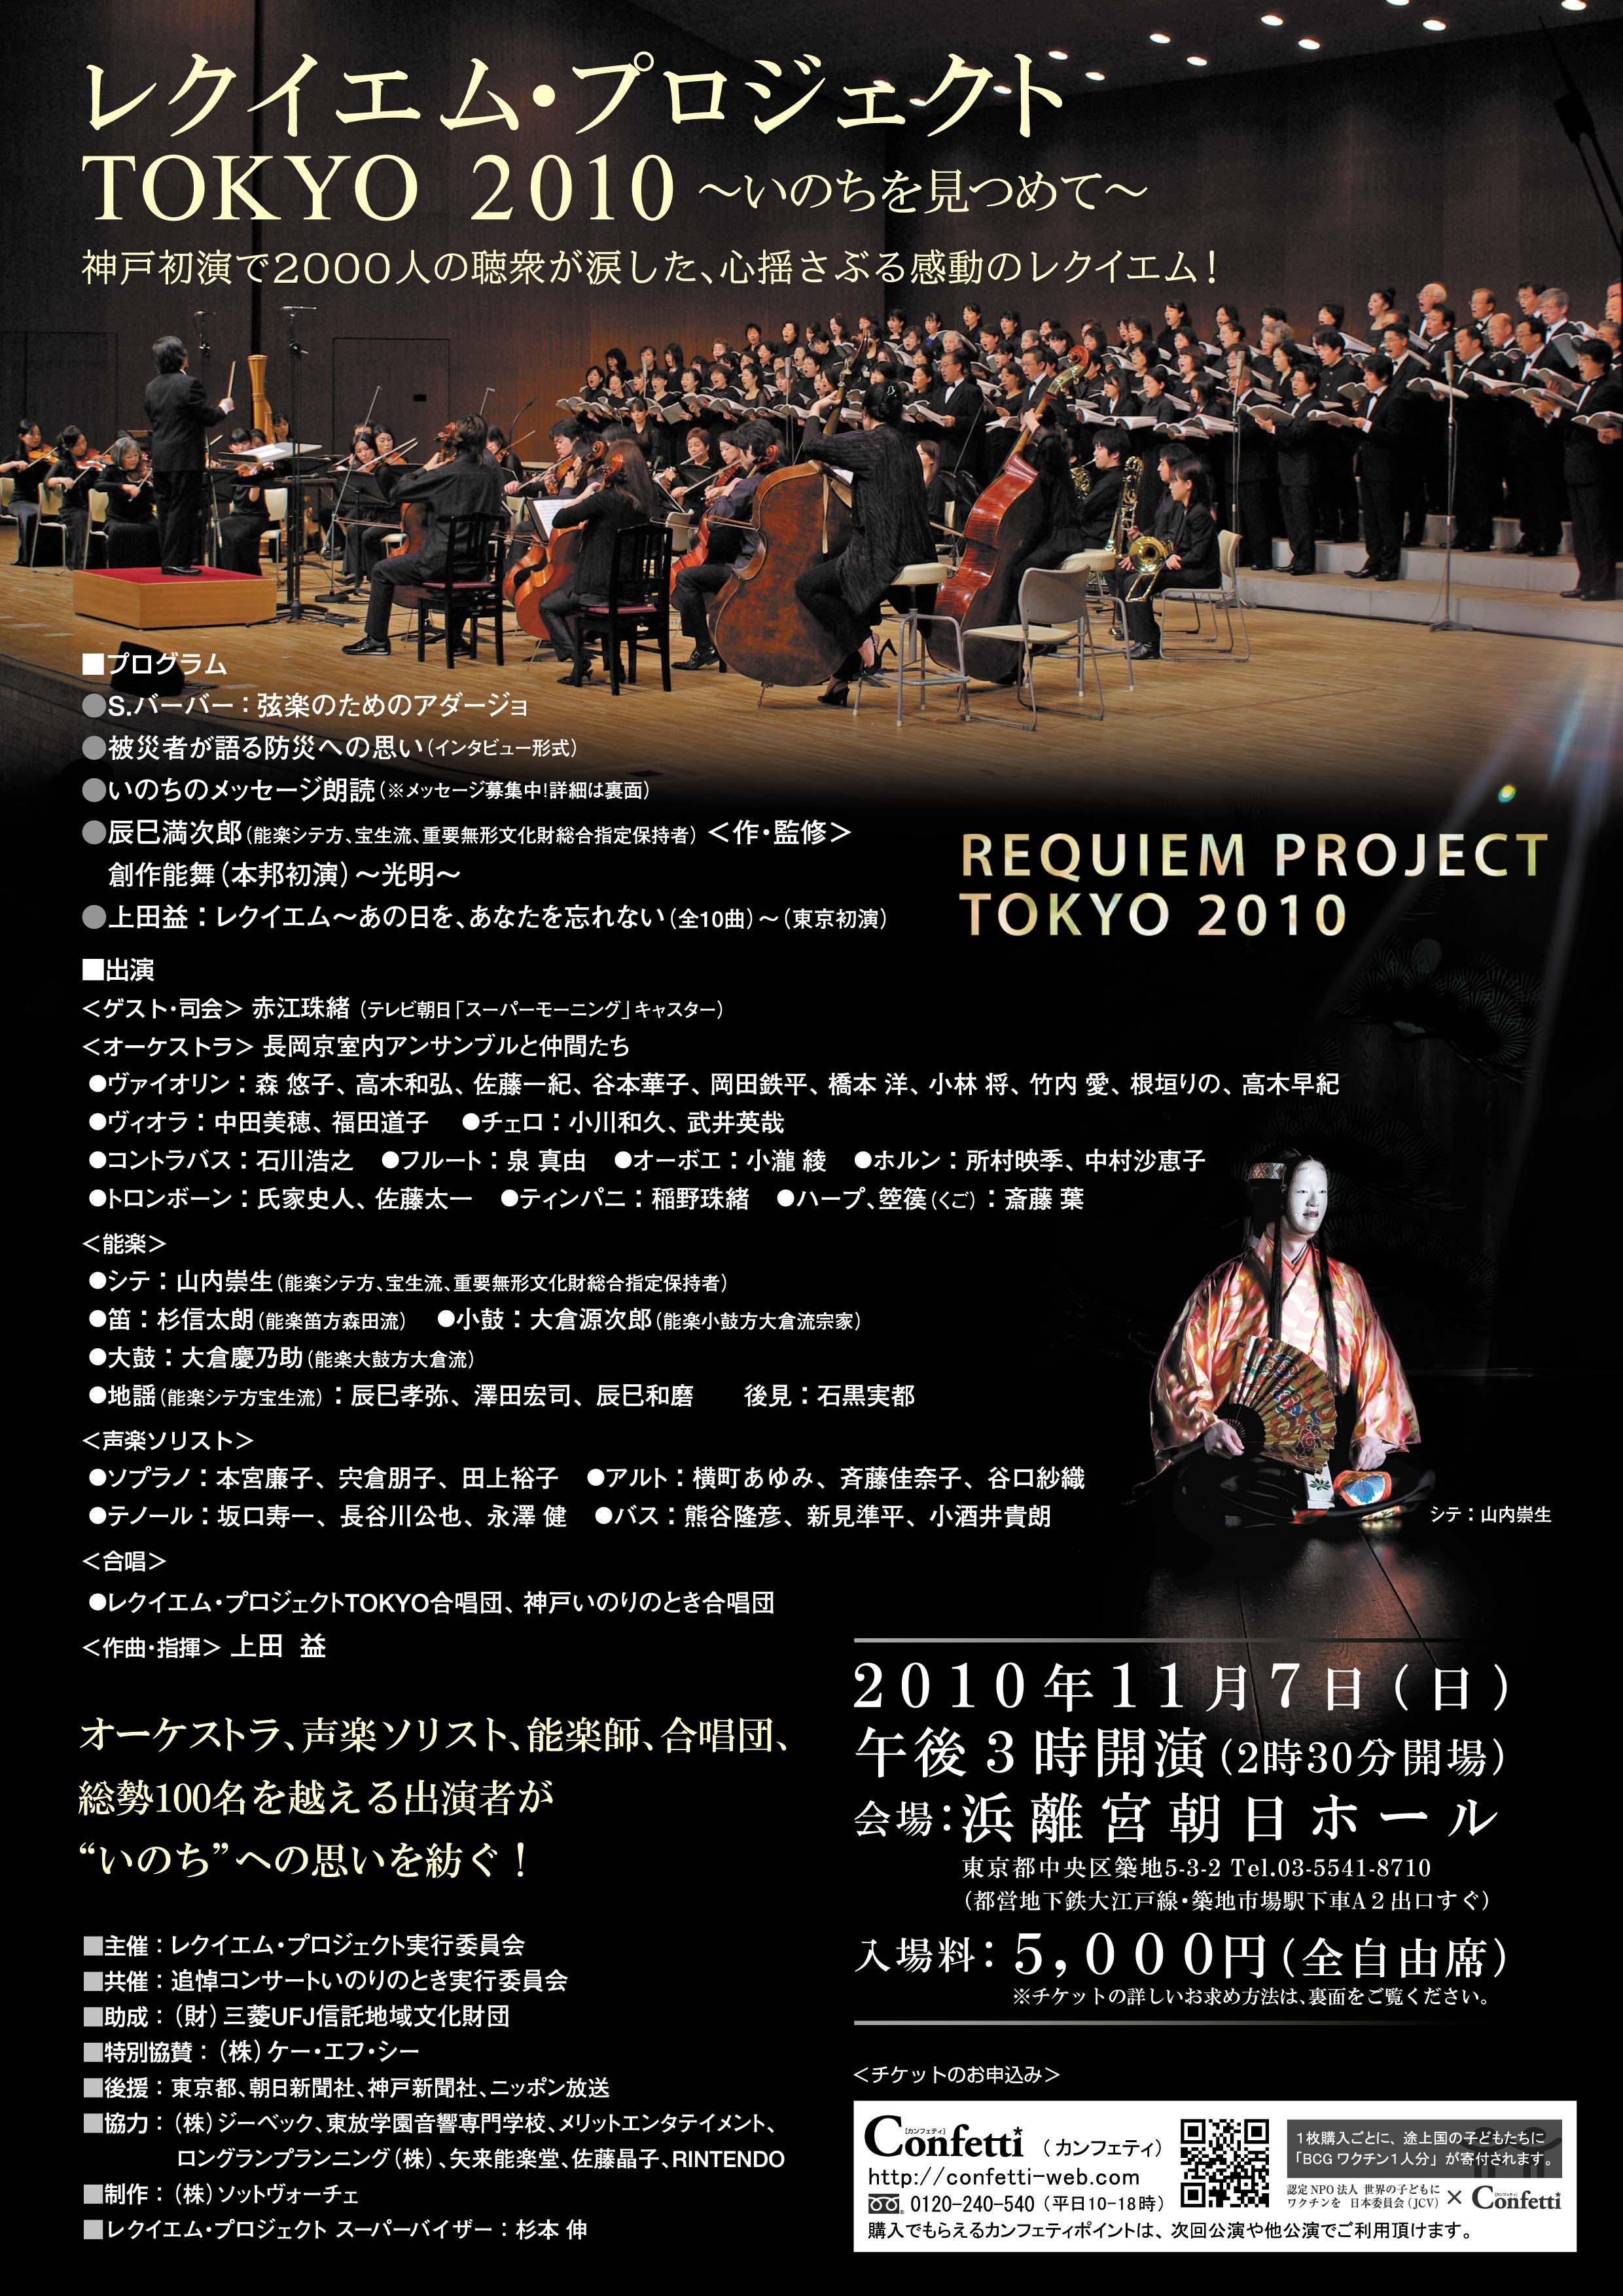 http://manjiro-nohgaku.com/news/req_tokyo.jpg